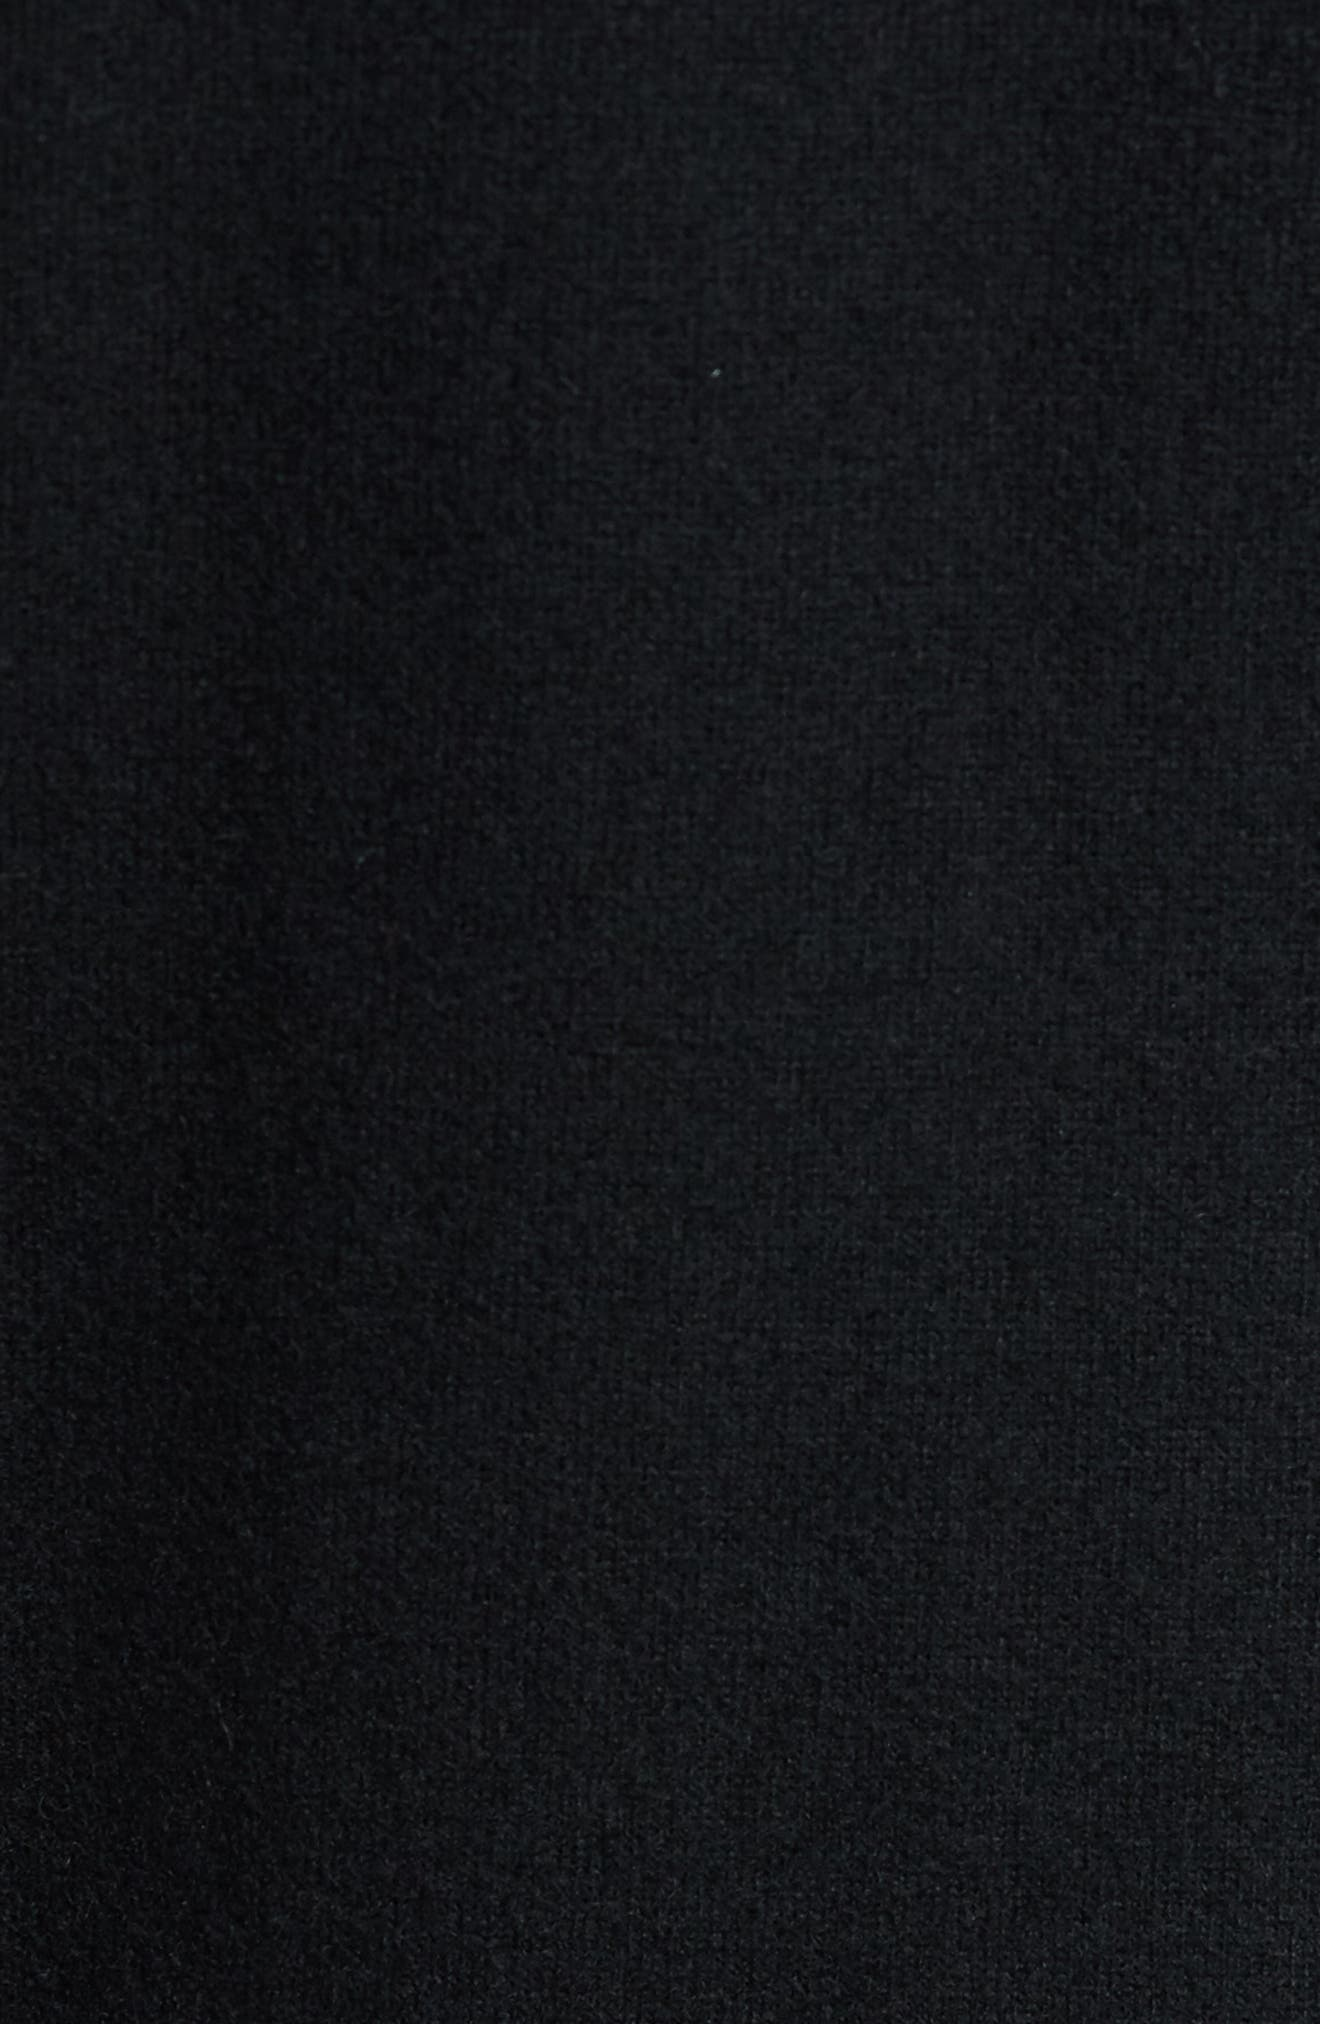 Wool Blend Hooded Cardigan,                             Alternate thumbnail 11, color,